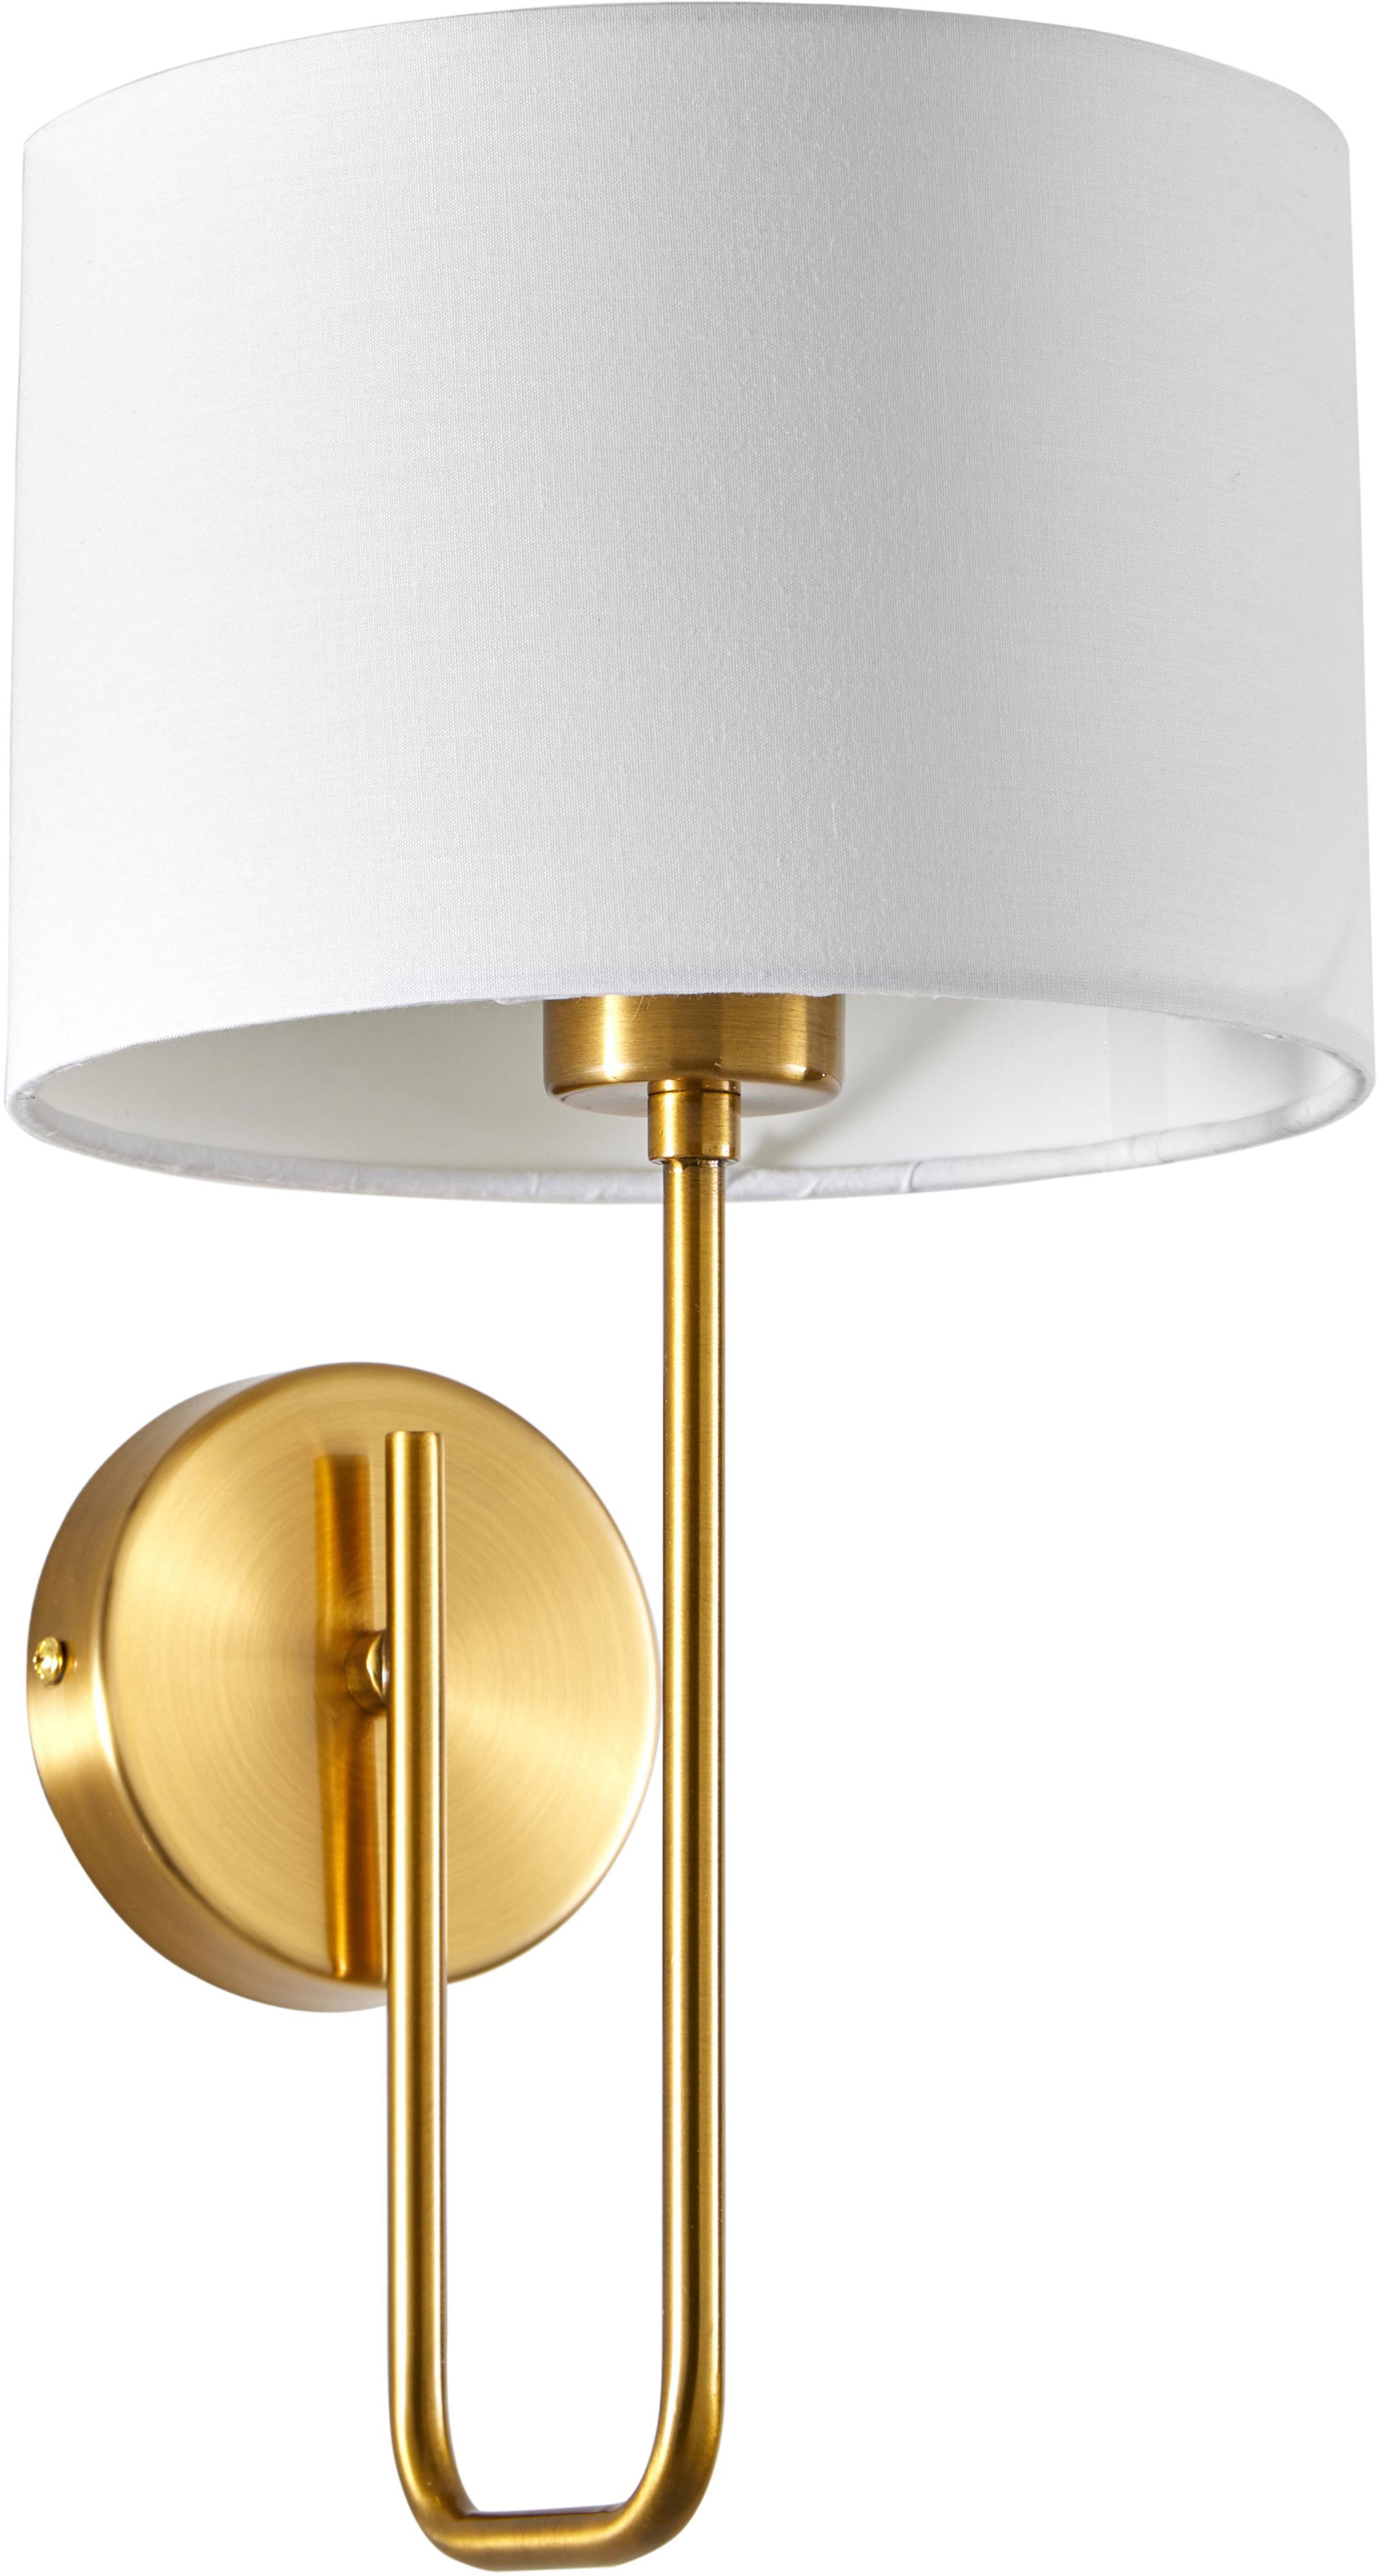 Wandleuchte Montreal, Lampenschirm: Textil, Weiß, Goldfarben, Ø 20 x H 36 cm